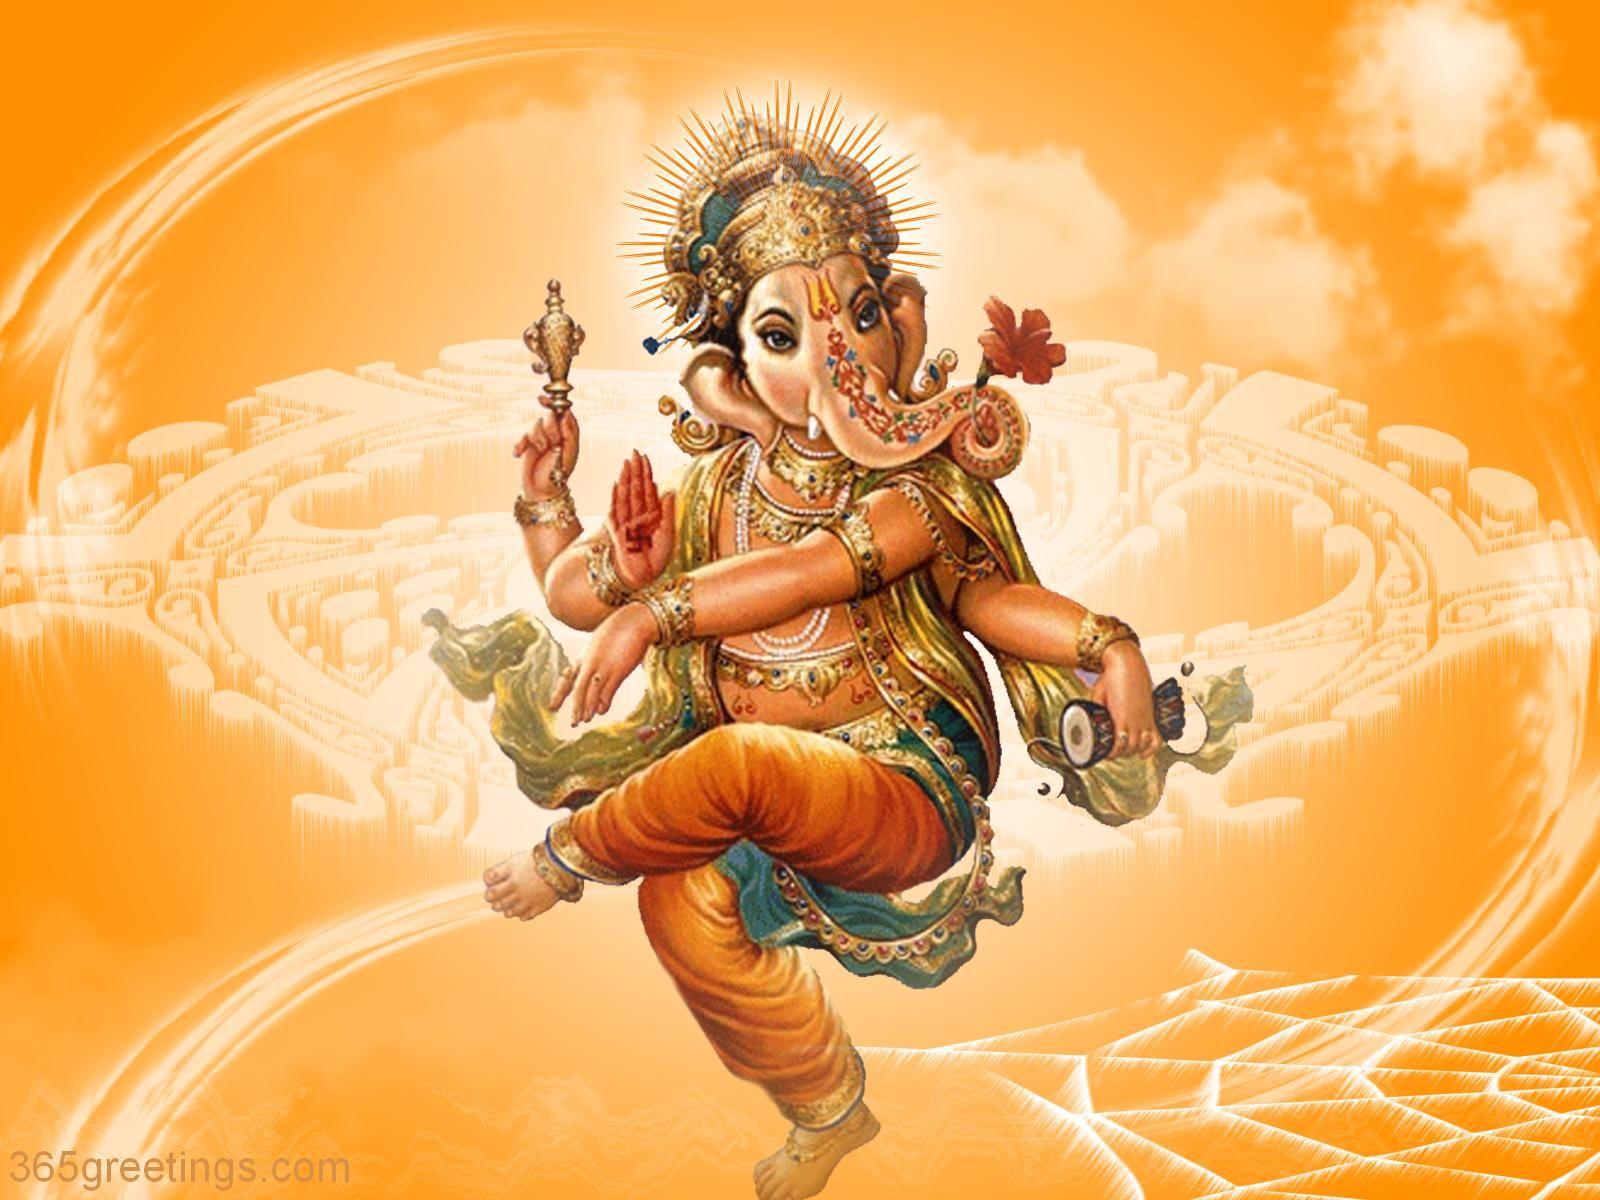 Indian God Ganesha God Ganesh Hindu Ganesha Iphone Mobile Phone Wallpaper With 1600x1200 Ganesha Pictures Ganesha Ganesh